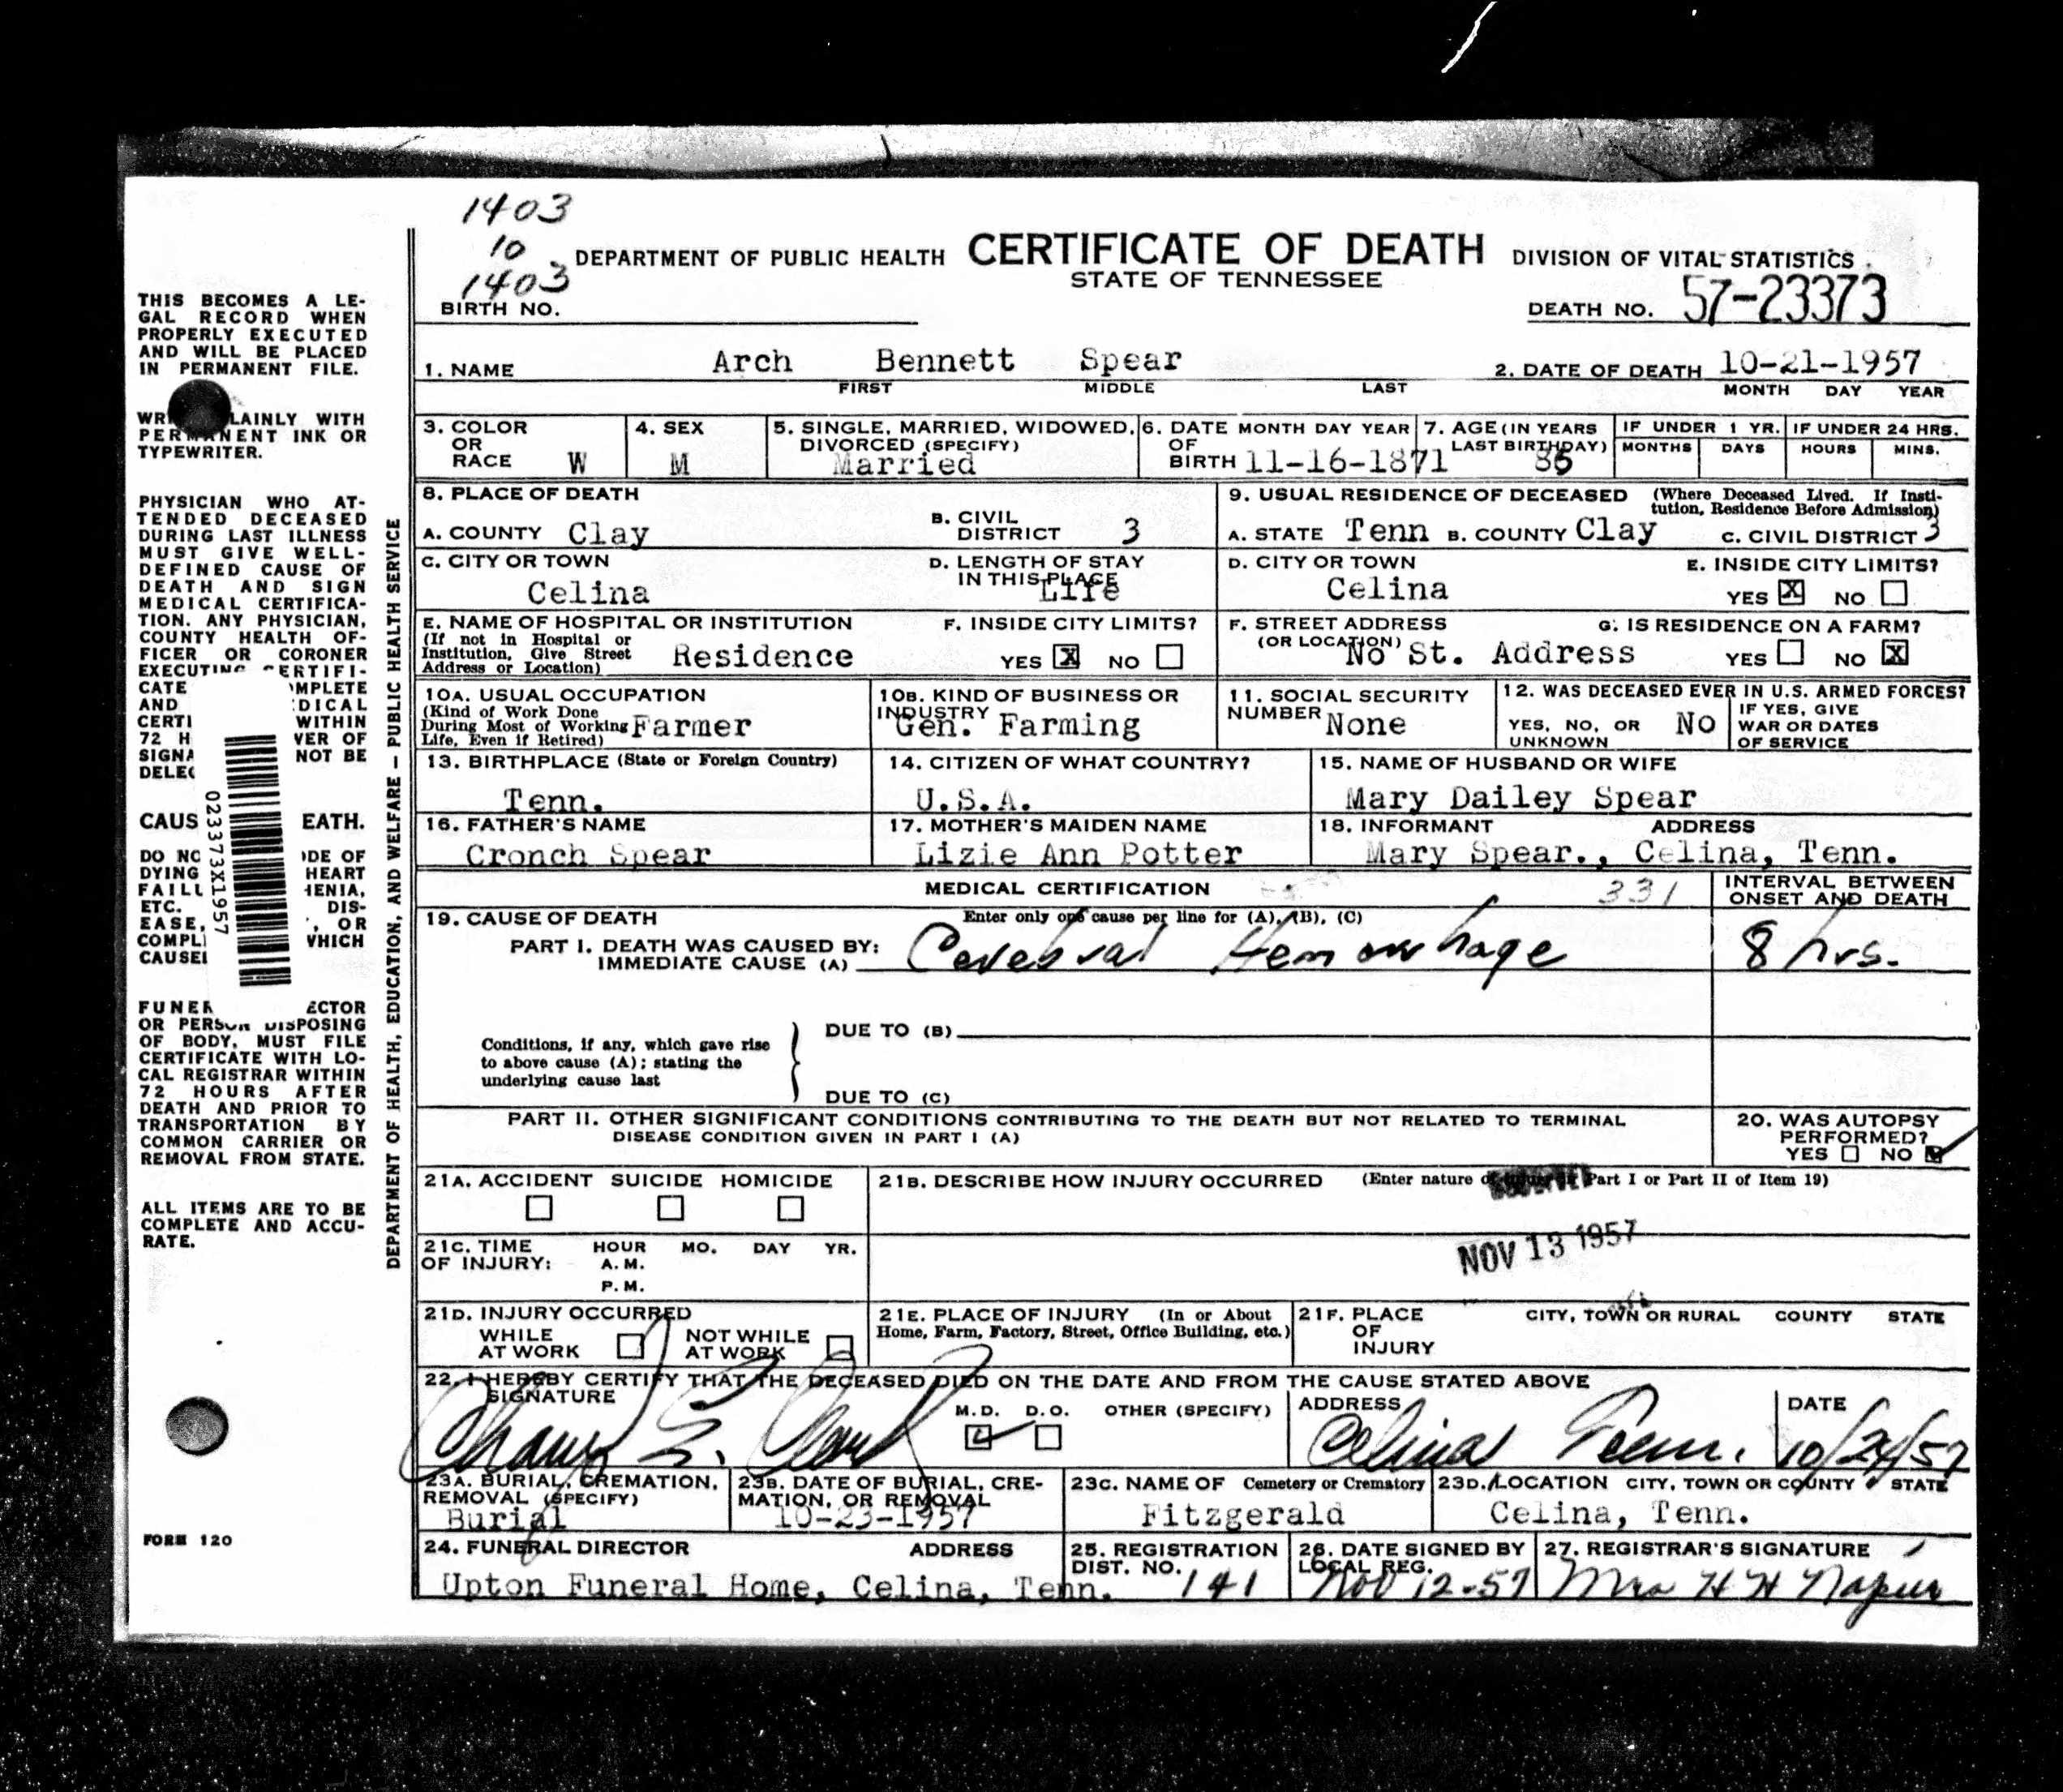 Archibald Bennett Bud Spear 1872 1957 Find A Grave Memorial